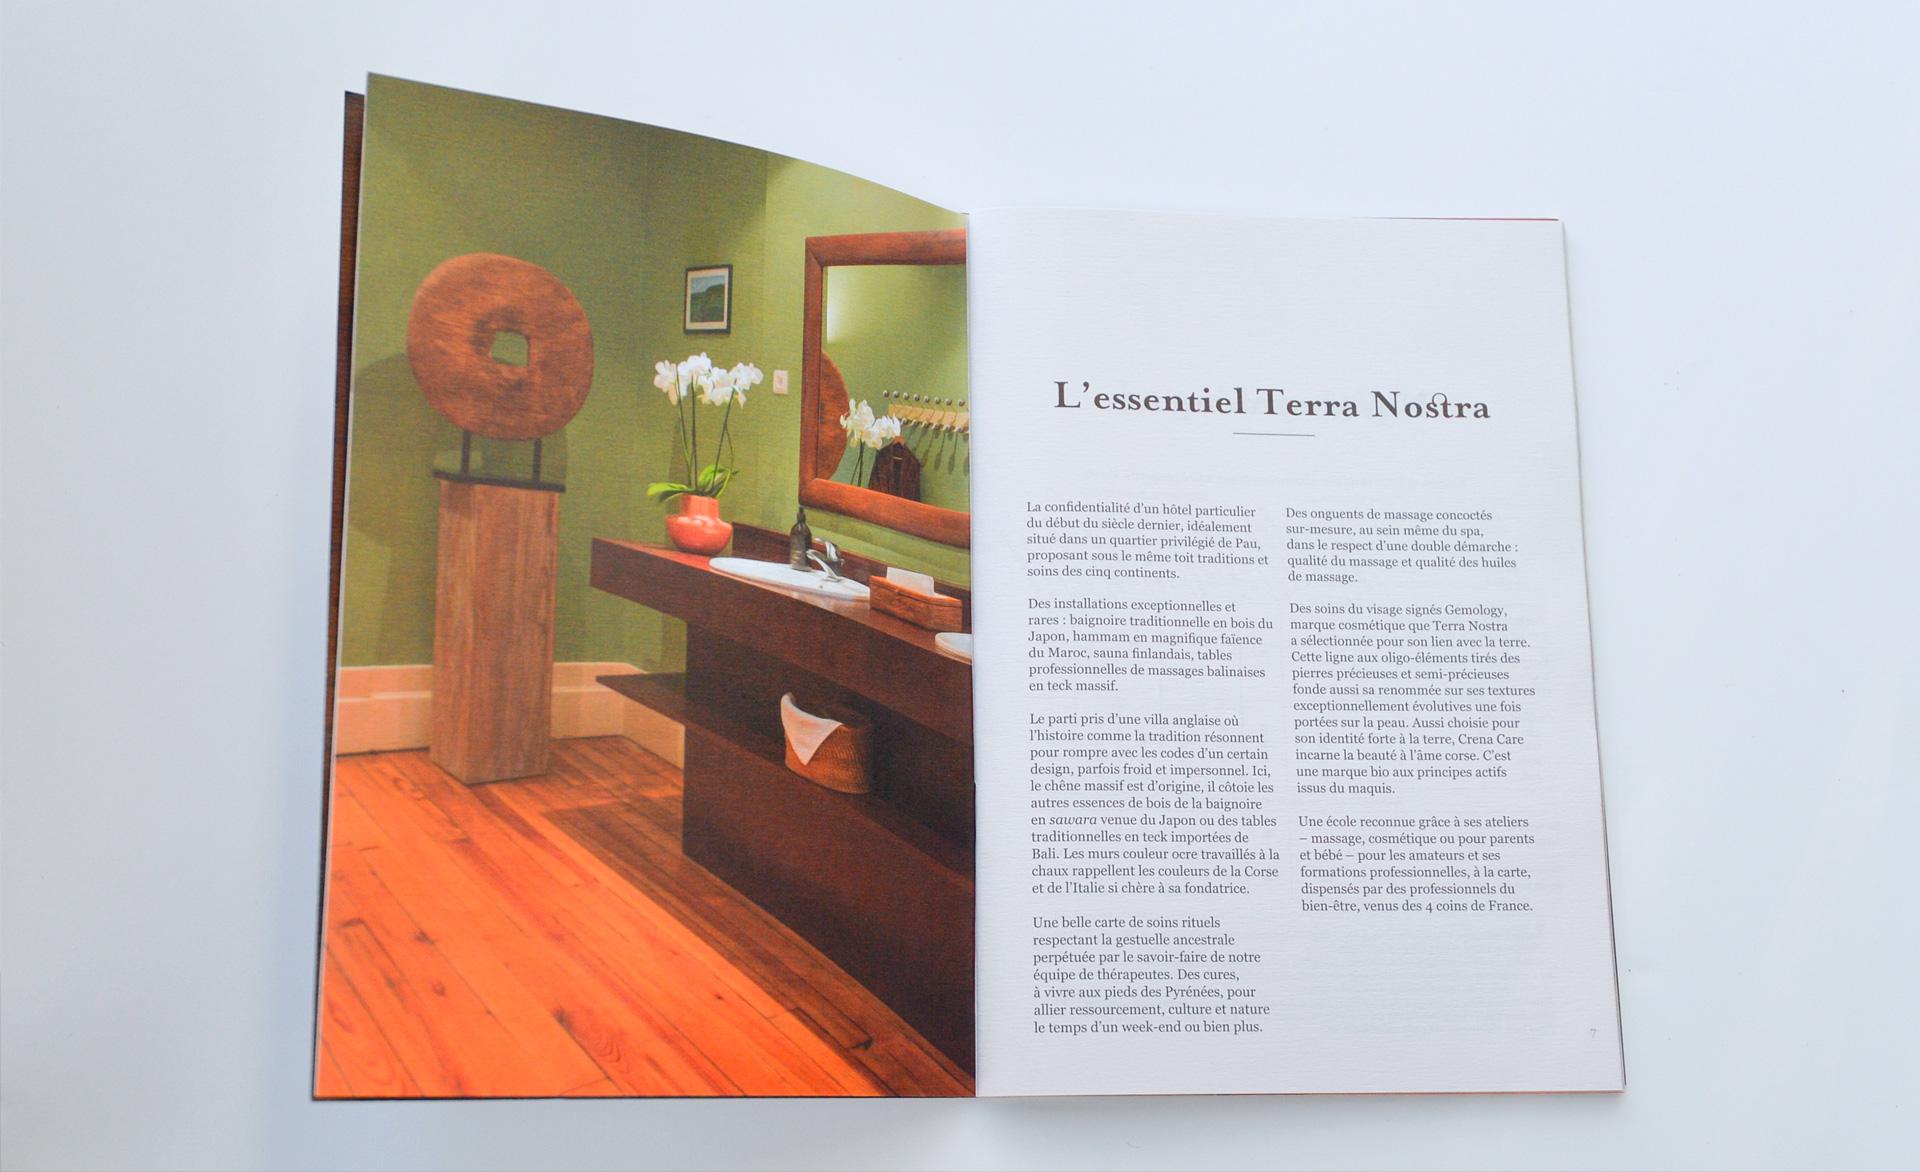 Spa Terra Nostra | Massages, soins, hammam, sauna | Pau